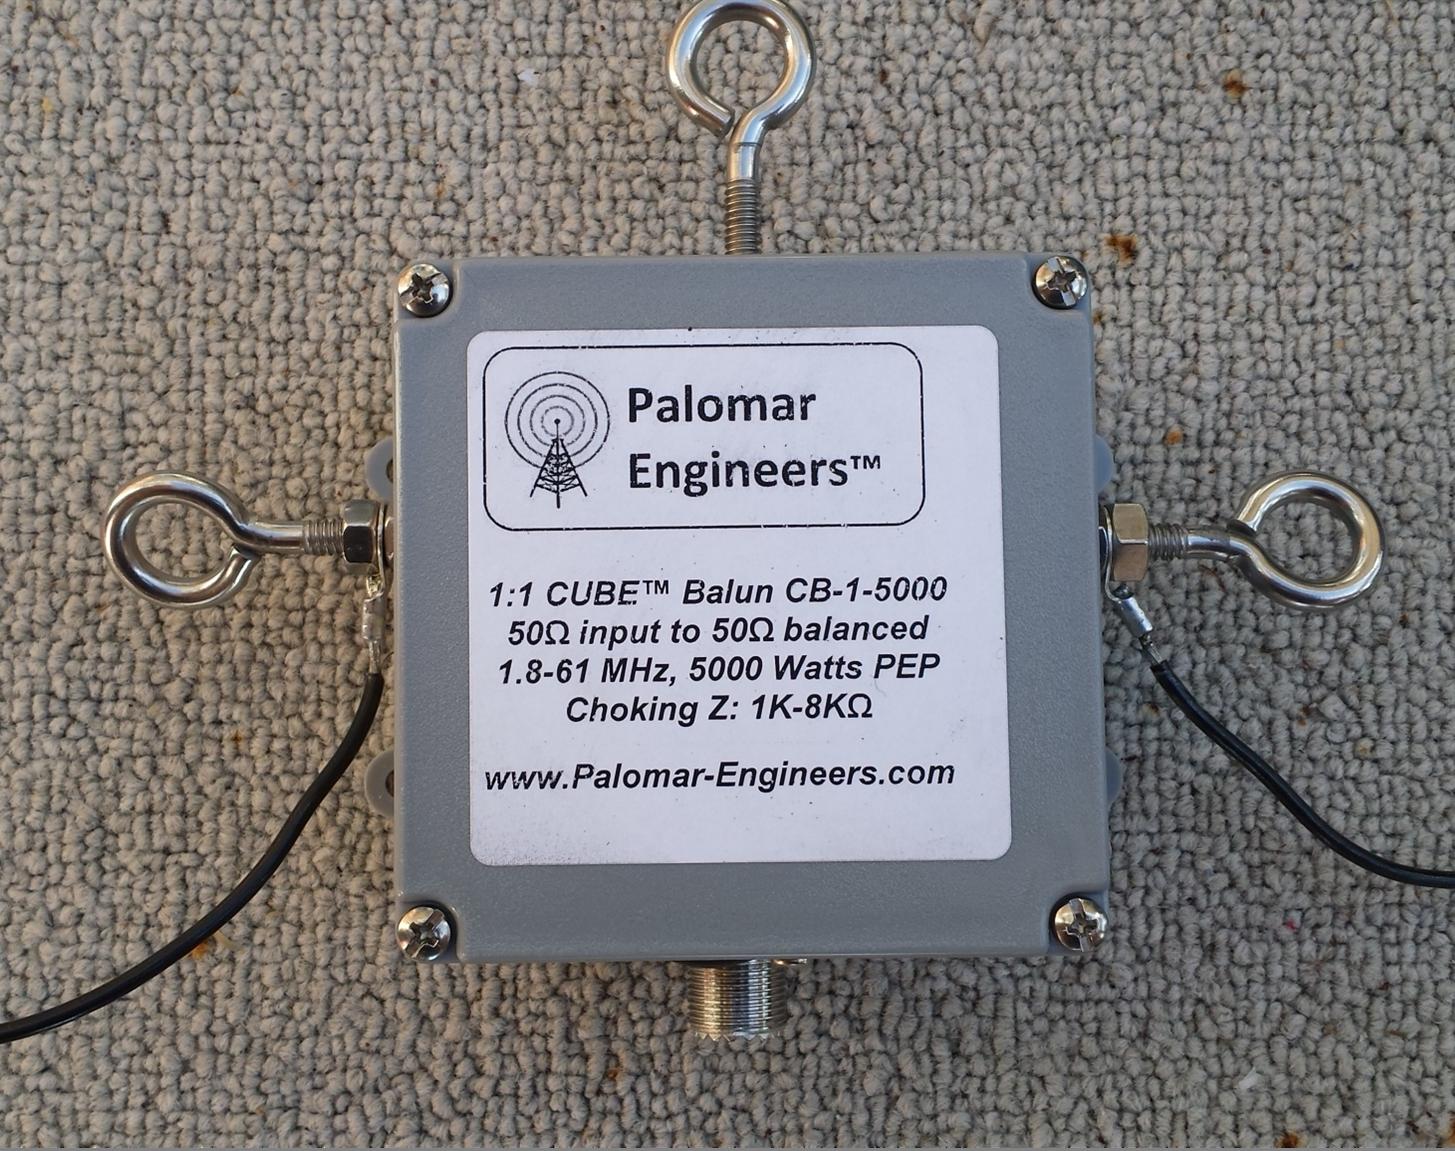 CUBE Feed Line Choke Balun, 5KW, 1.8-61 MHz Eyebolts/Top Studs Dipole CB-1-5000